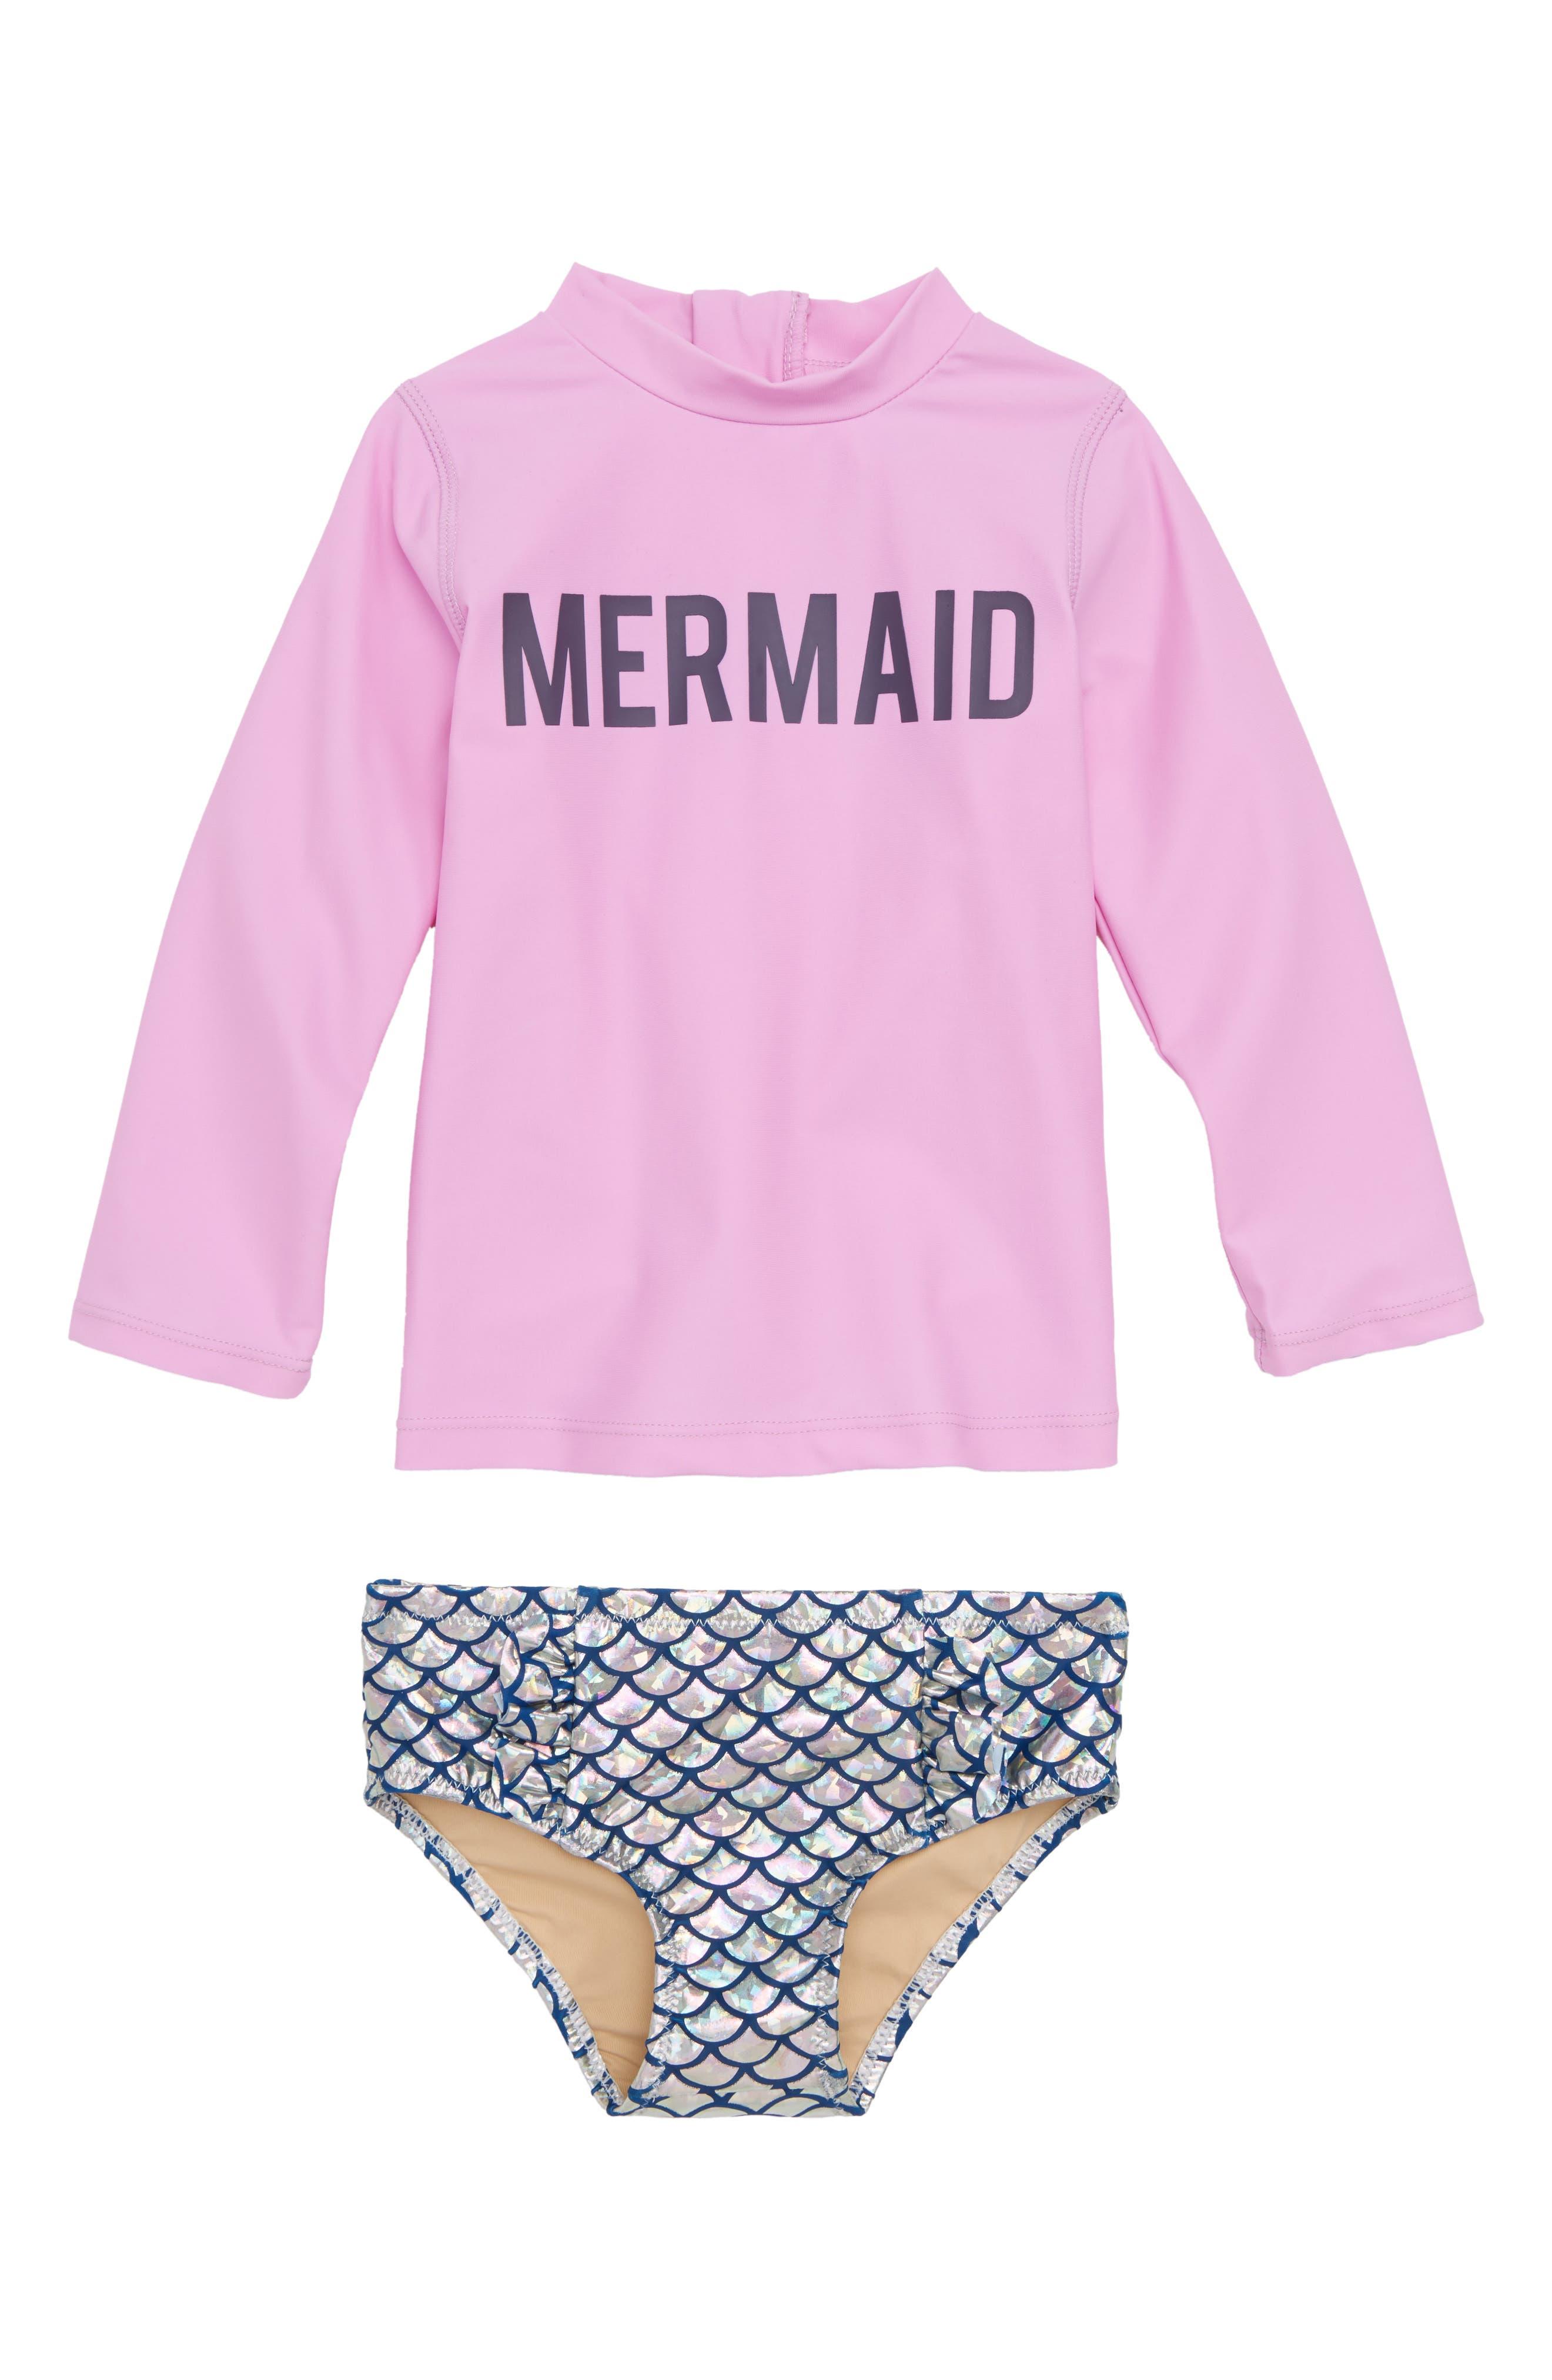 SHADE CRITTERS Mermaid Magic Rashguard Two-Piece Swimsuit, Main, color, 500